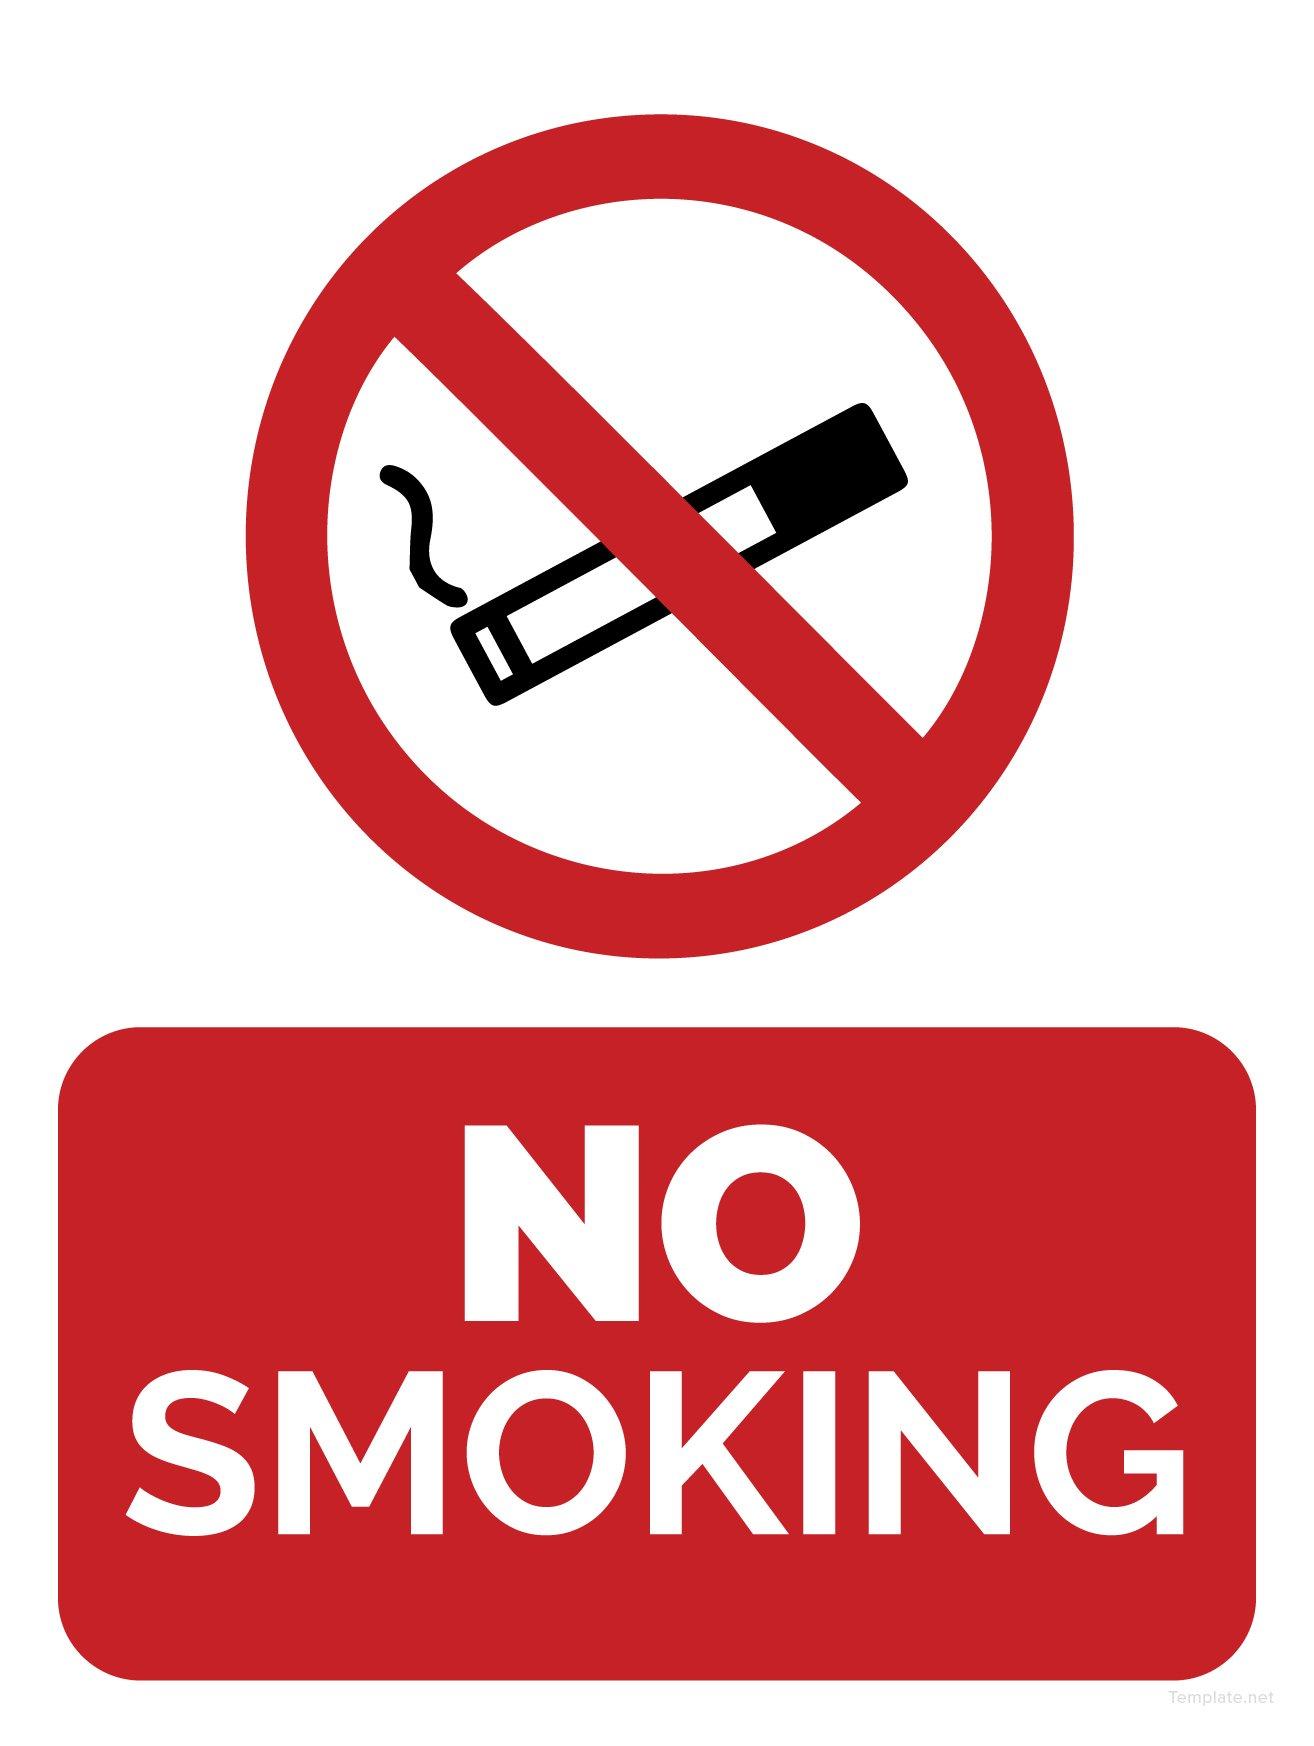 free no smoking template in adobe photoshop  illustrator